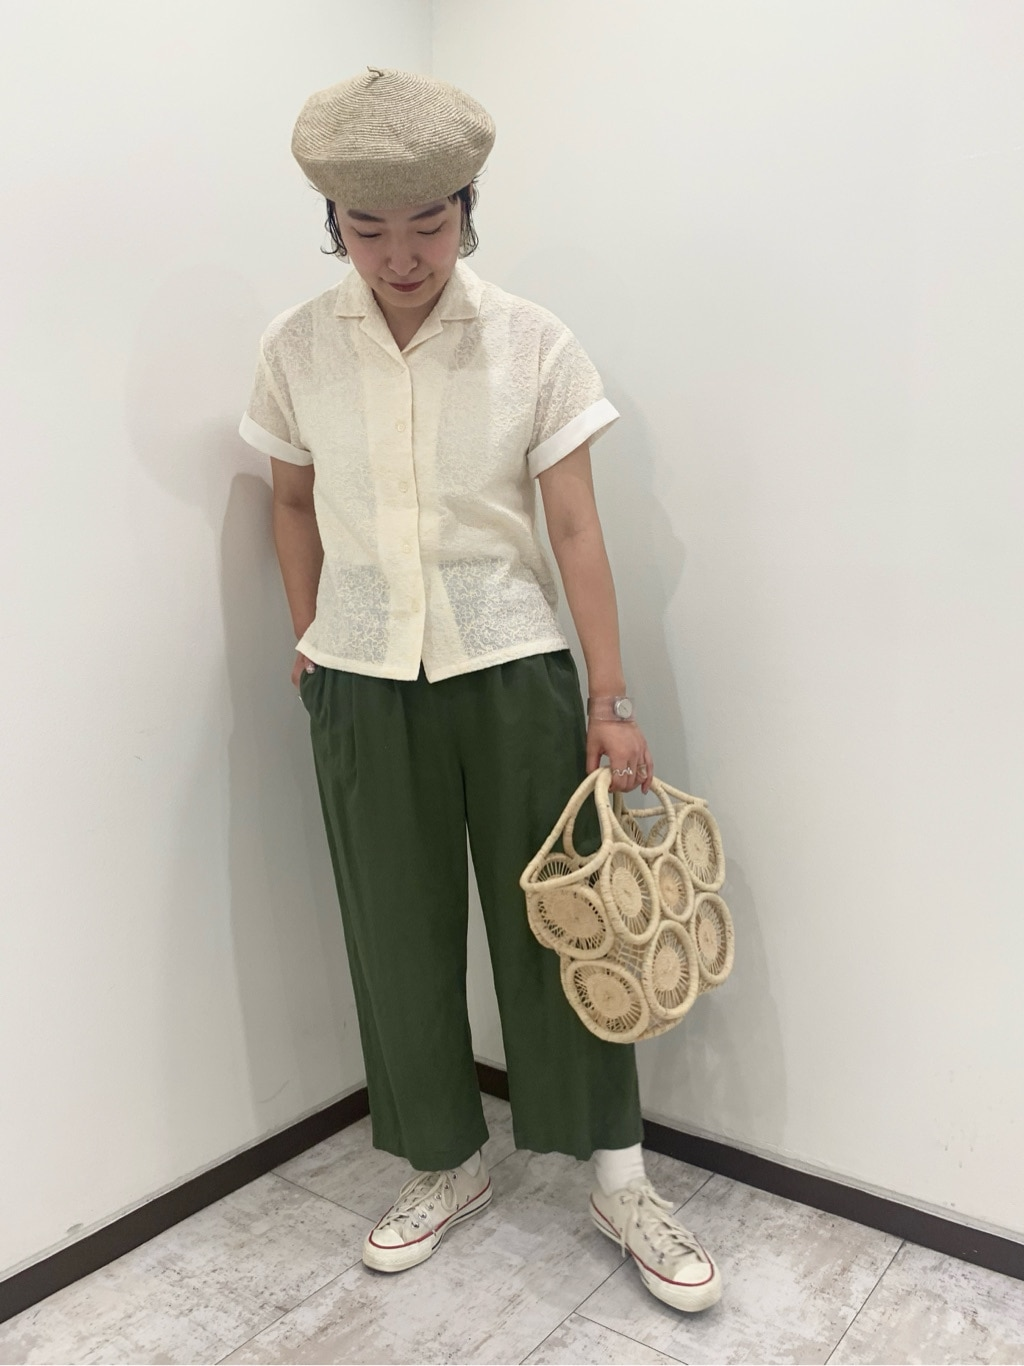 bulle de savon 新宿ミロード 身長:159cm 2020.06.25